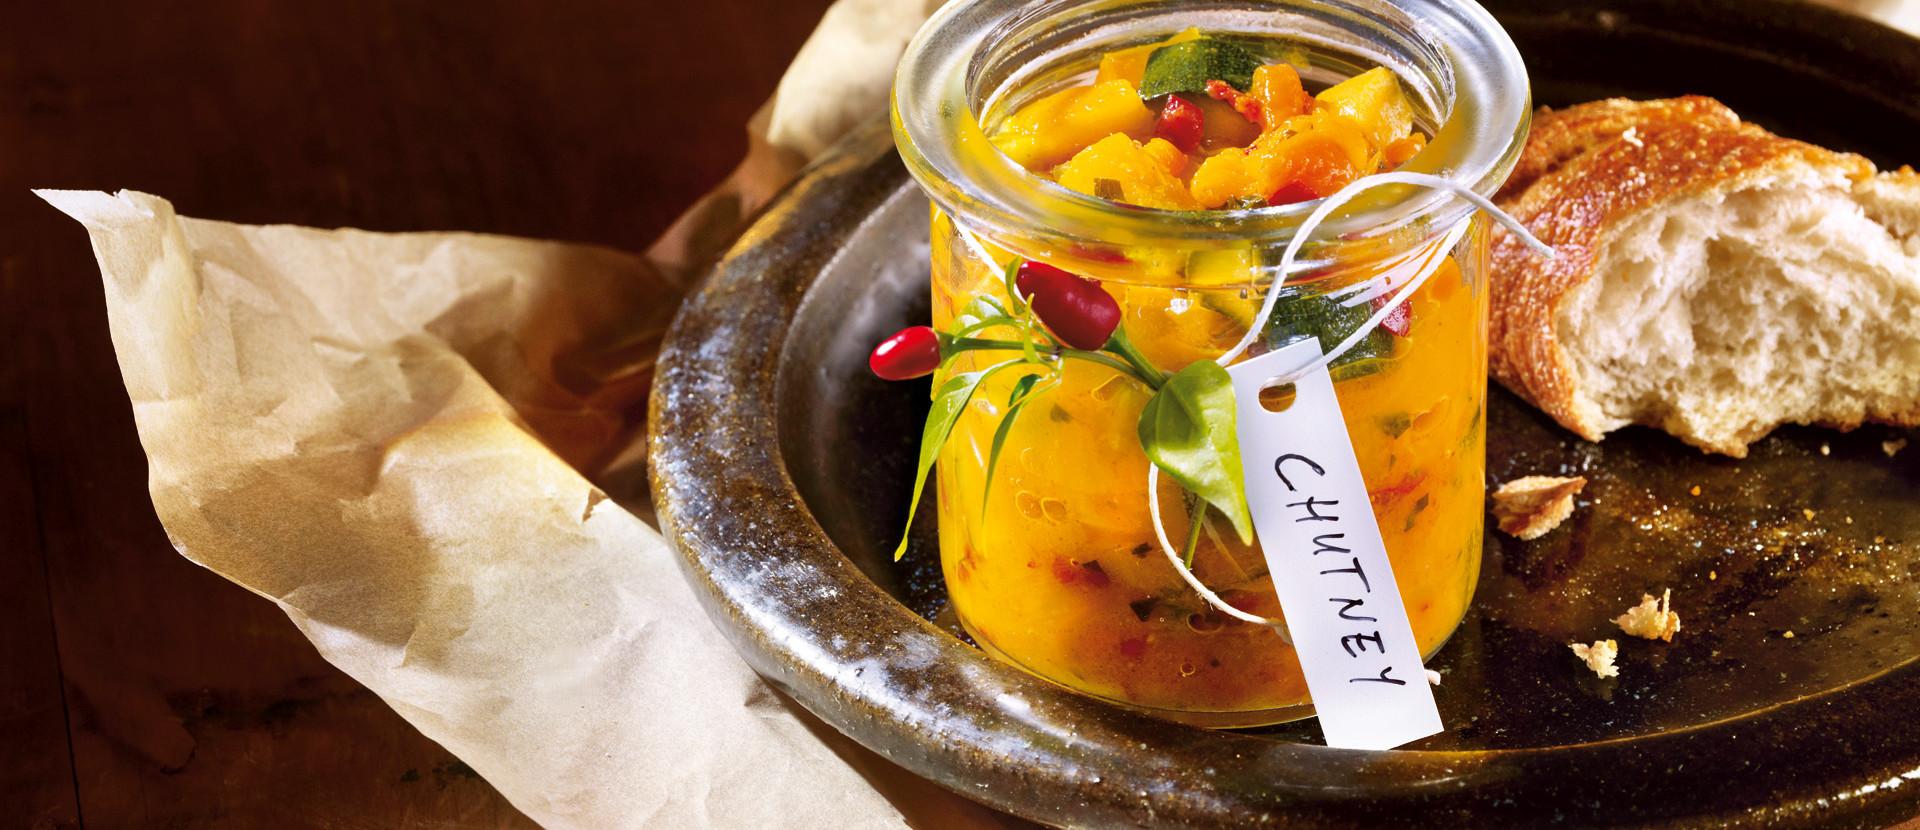 Pfirsich Mango Zucchini Chutney